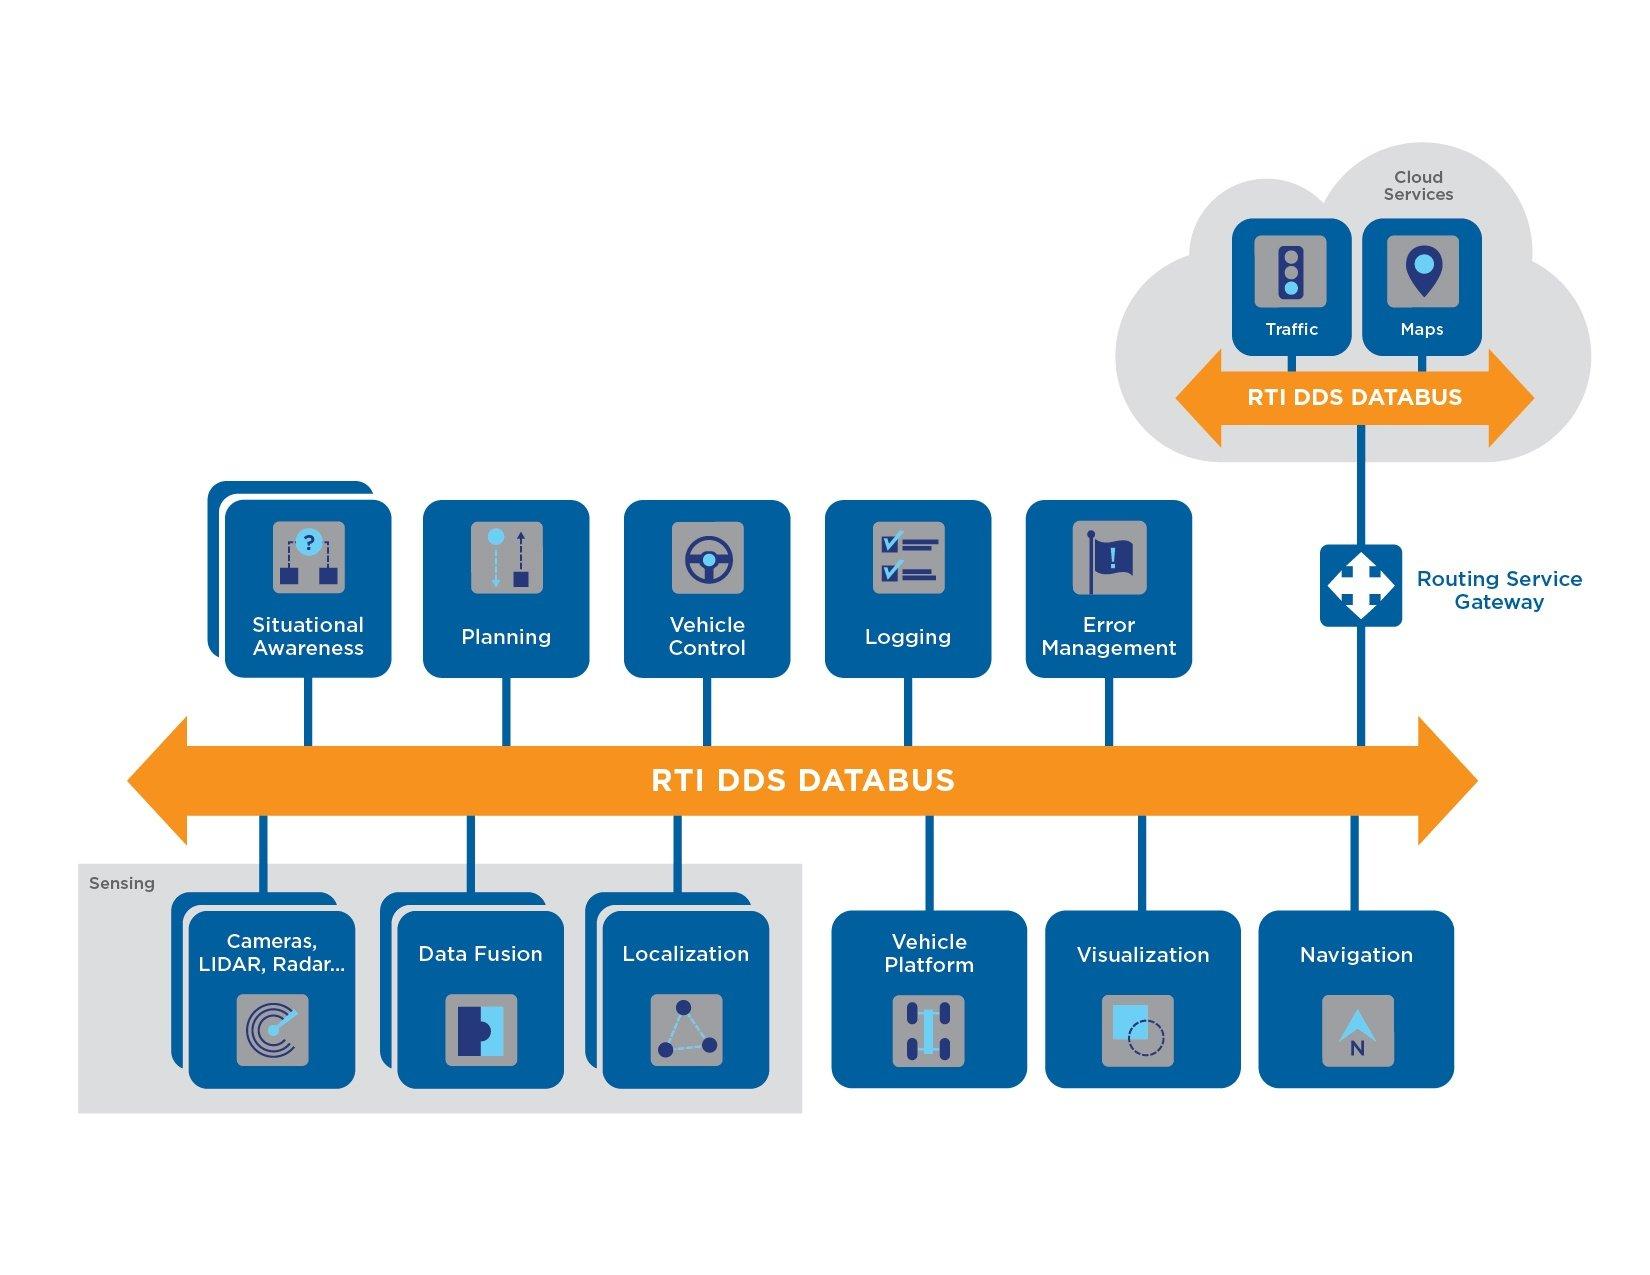 rti dds databus architecture